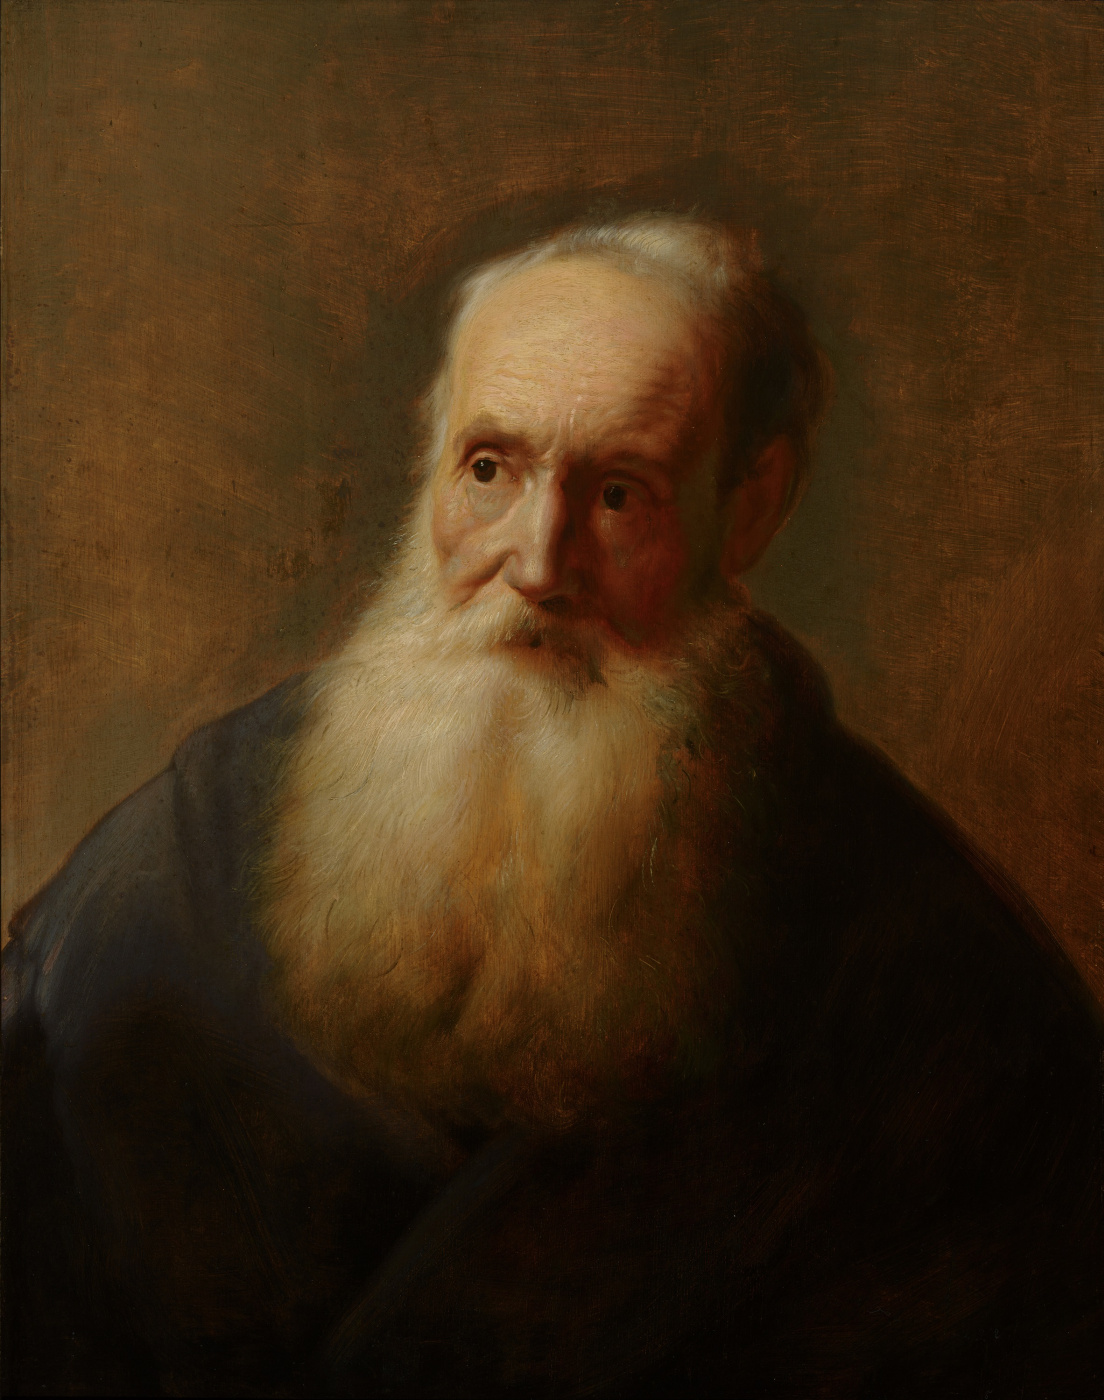 Jan Lievens. Portrait of an elderly man with a beard